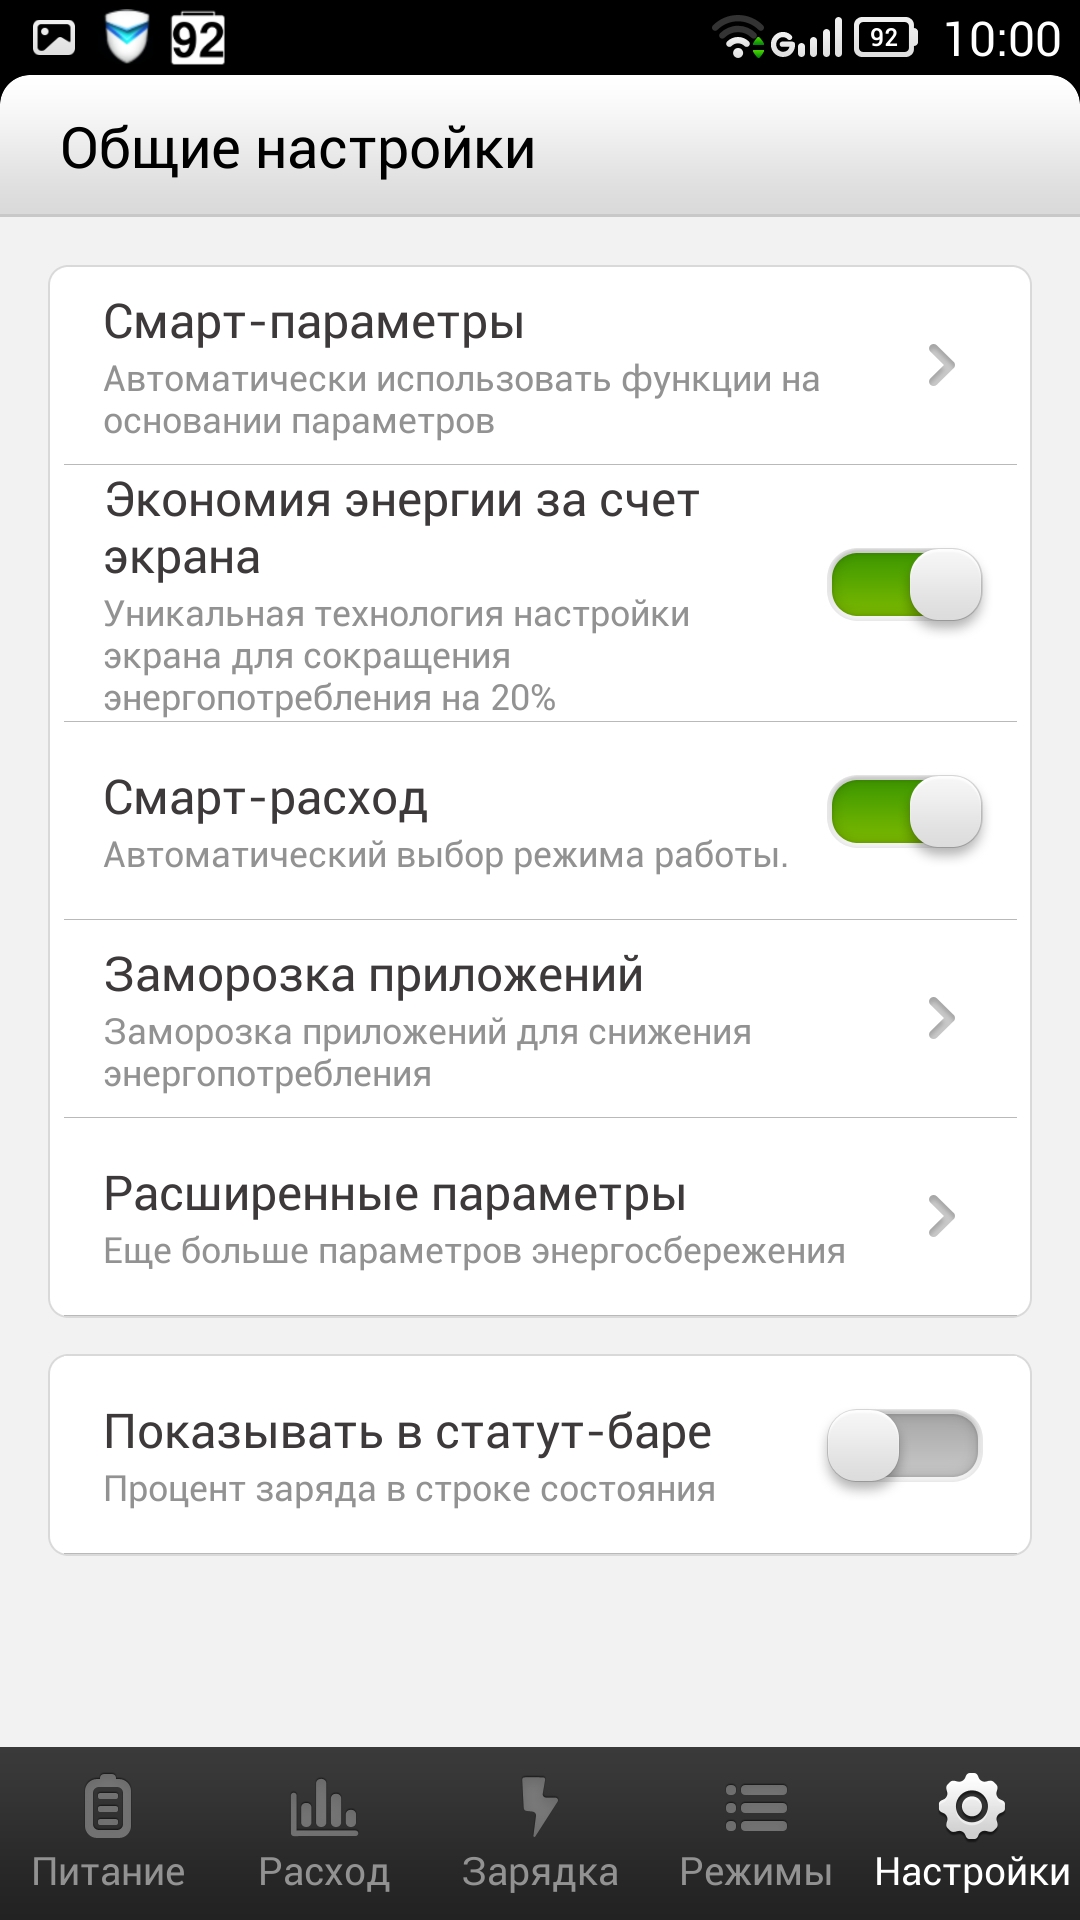 Screenshot_2014-05-20-10-00-55